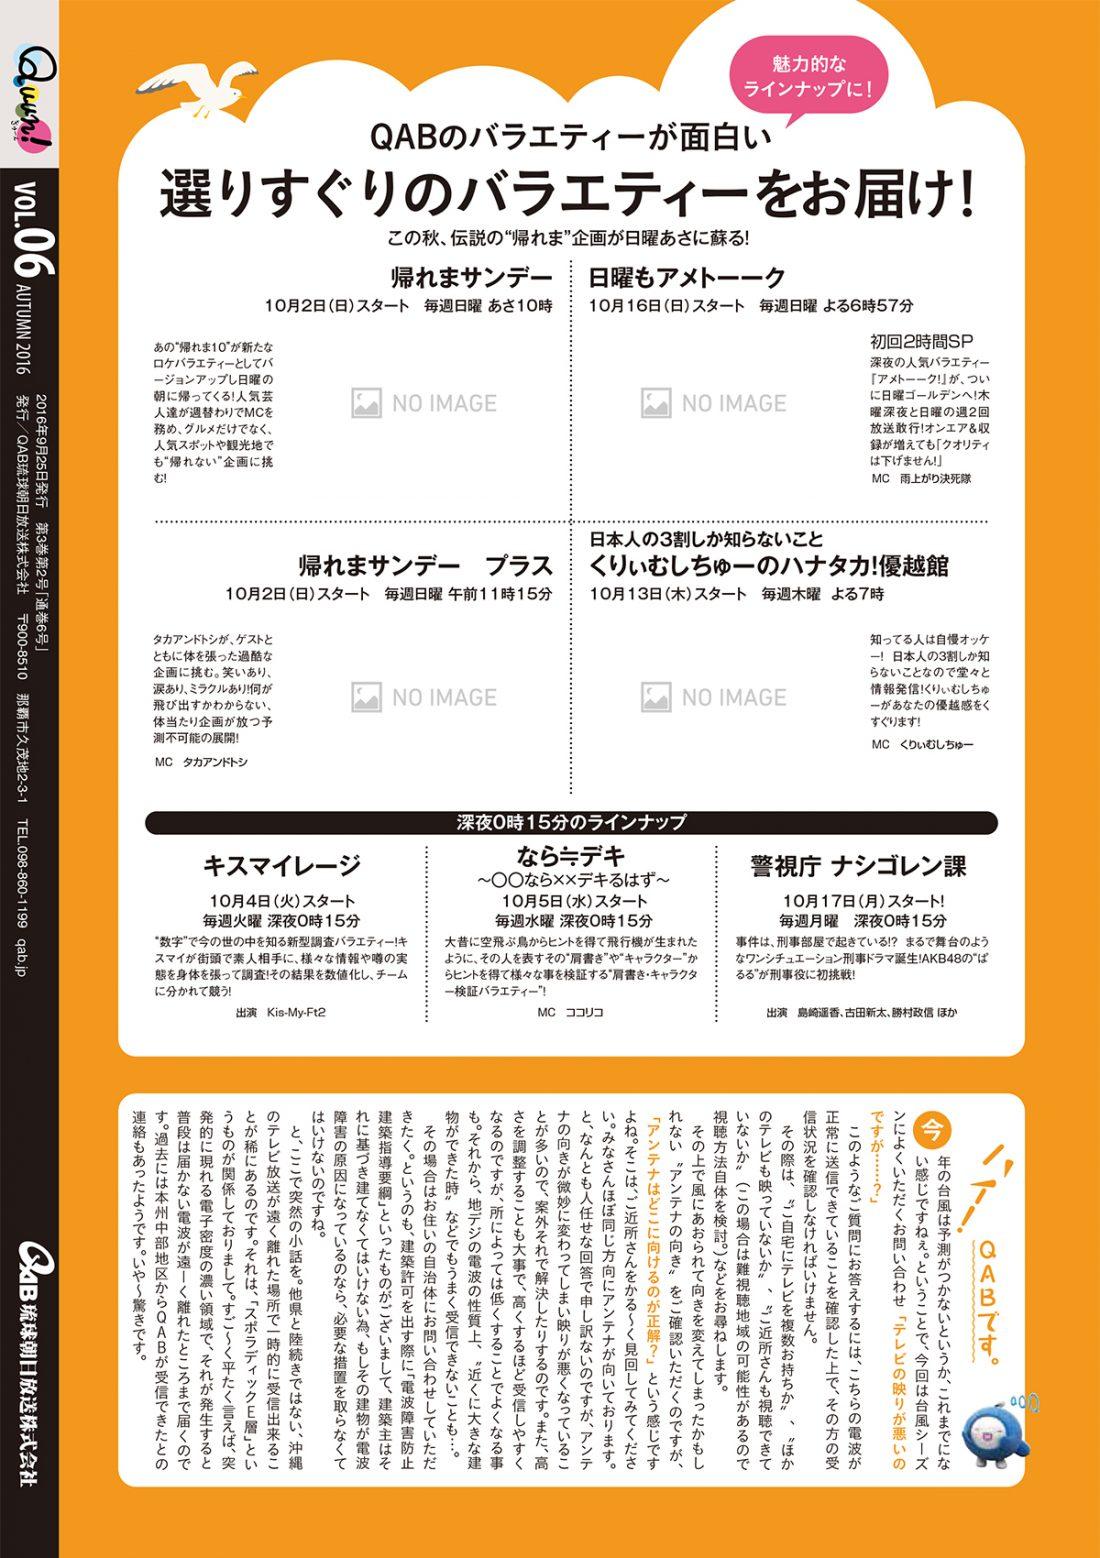 https://www.qab.co.jp/qgoro/wp-content/uploads/quun_0616-1100x1558.jpg